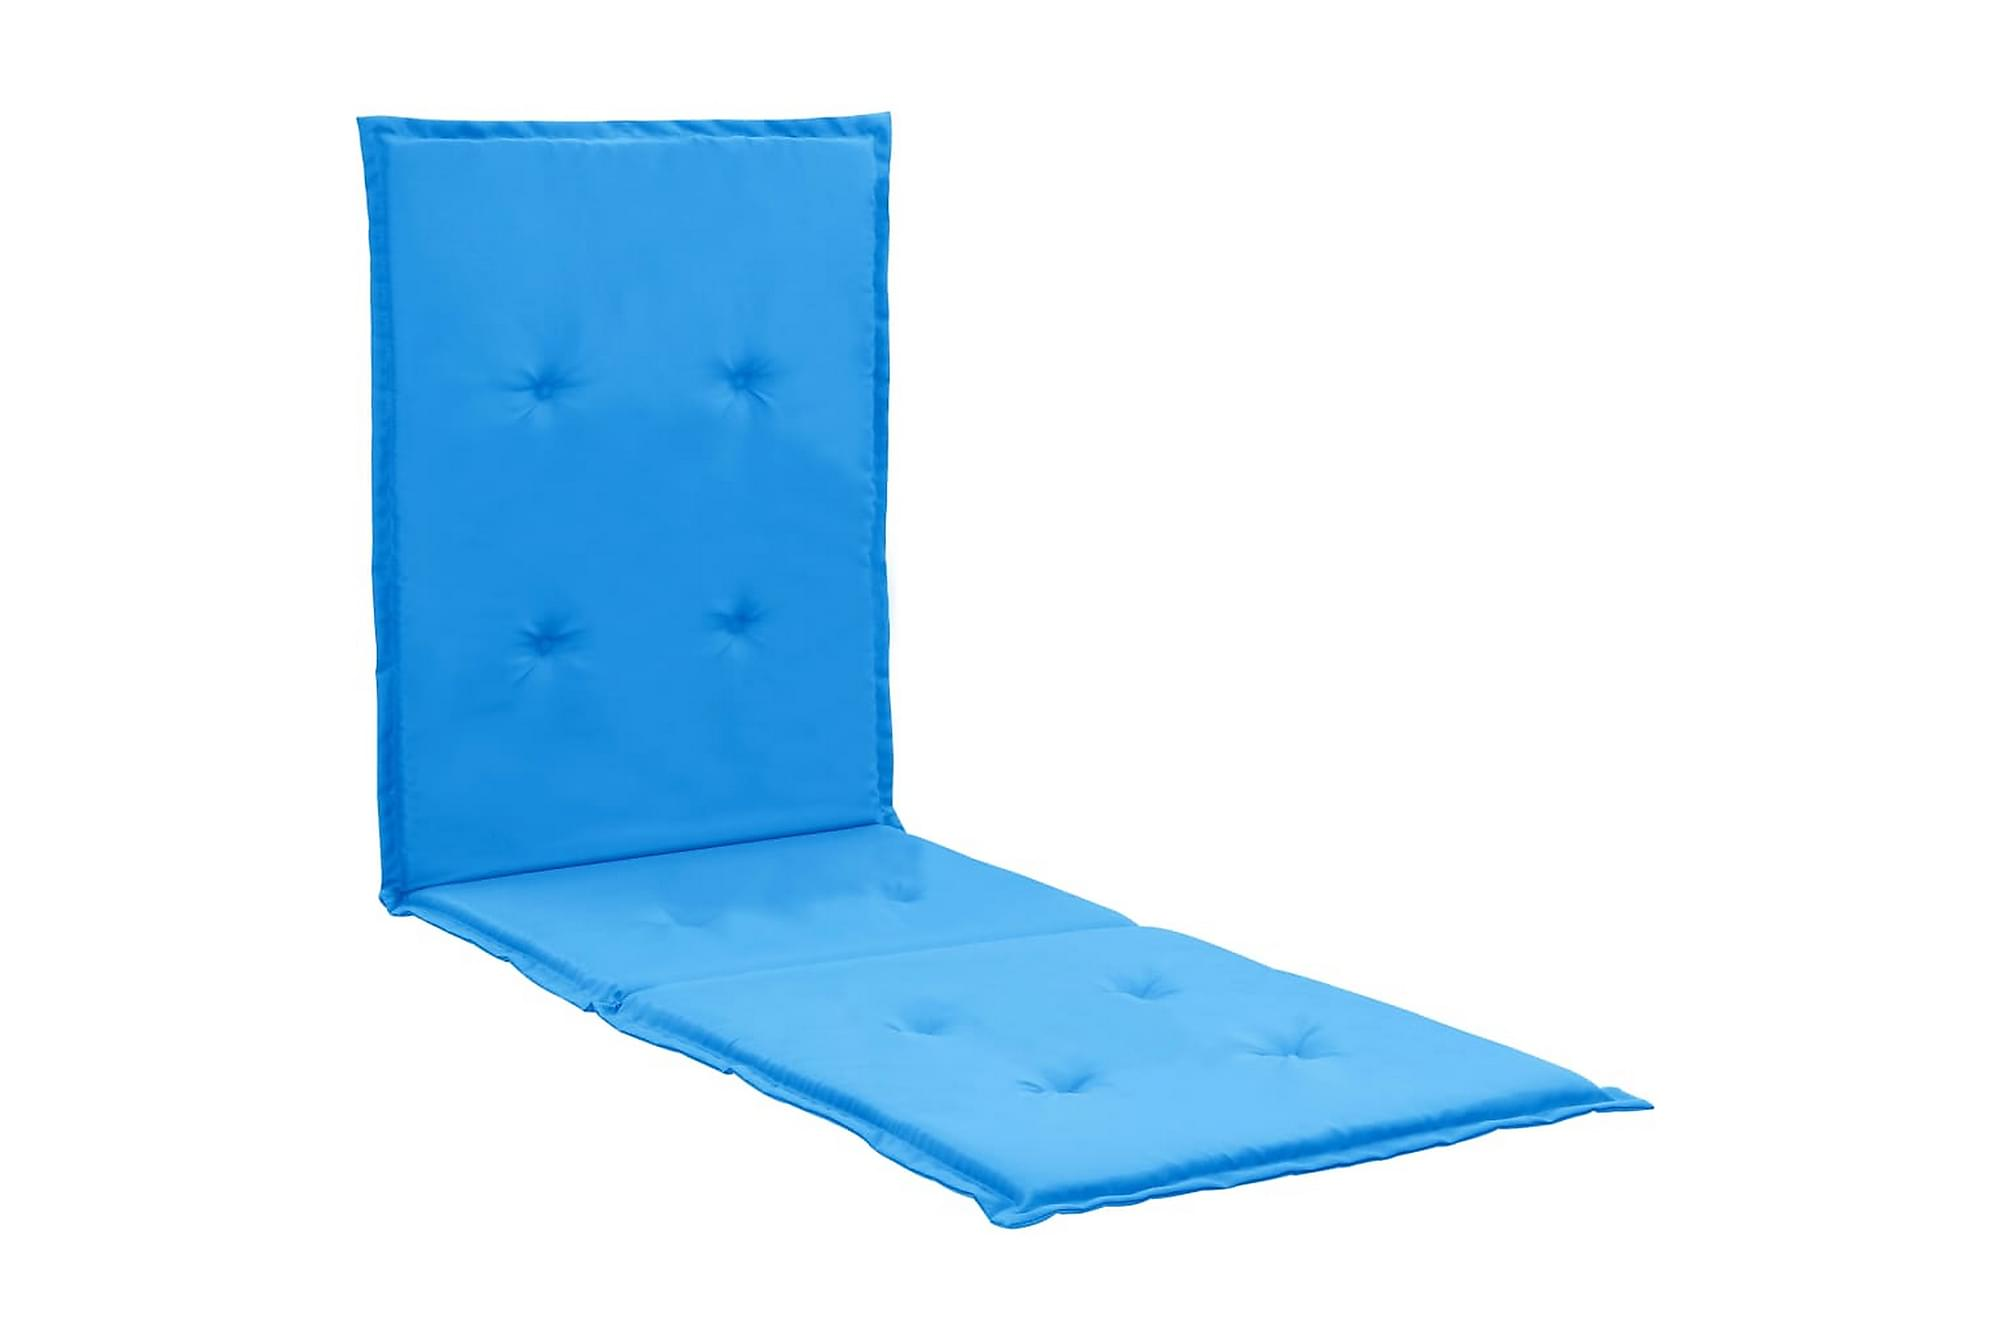 Dyna för solstol blå 180x55x3 cm, Positionsdynor